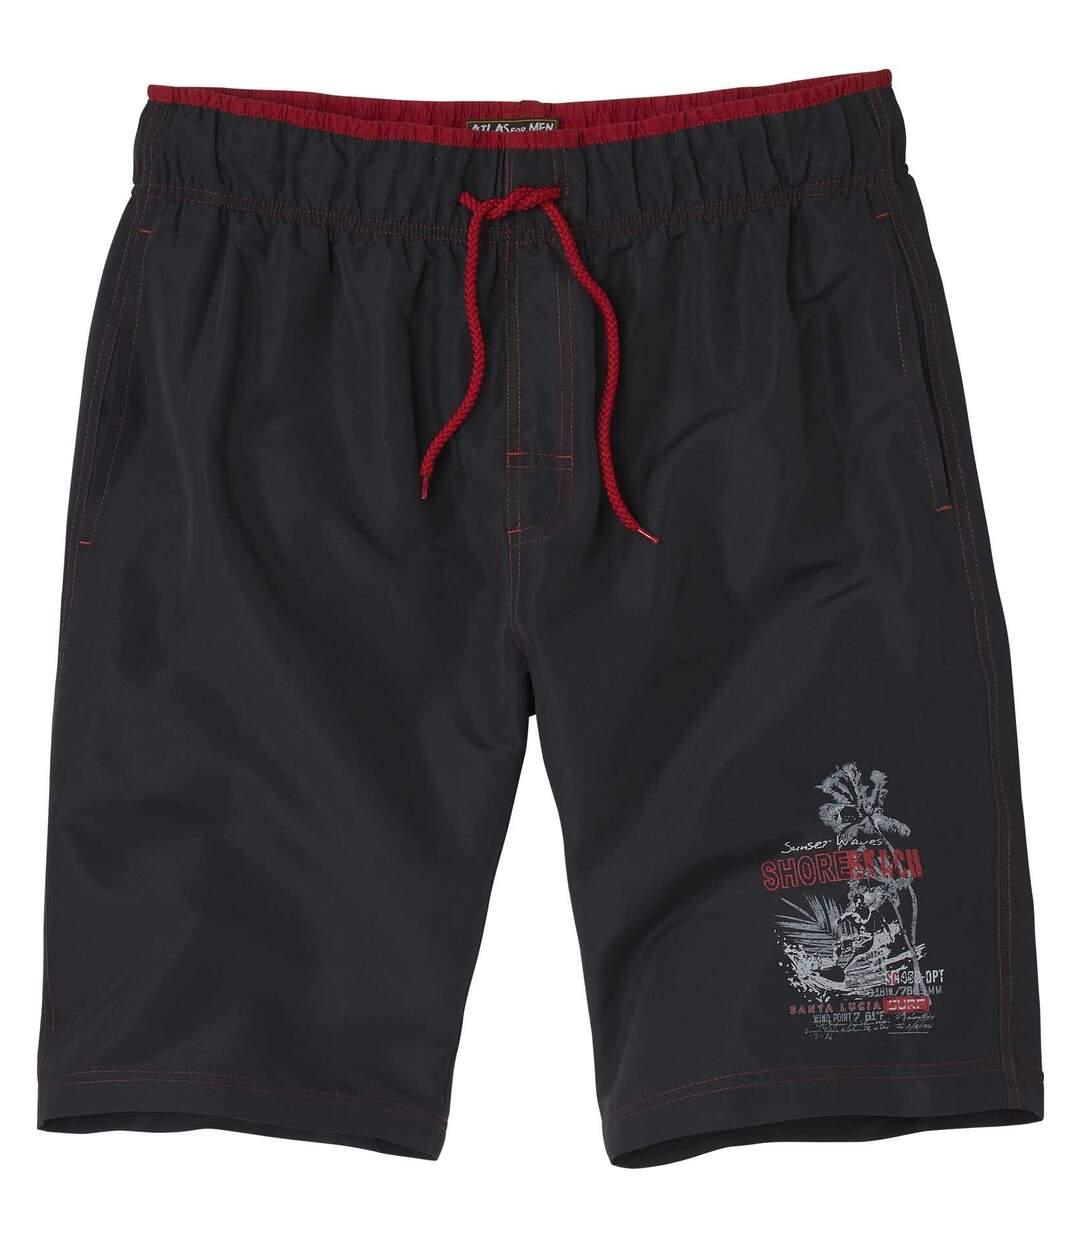 Men's Surf Print Swim Shorts - Black